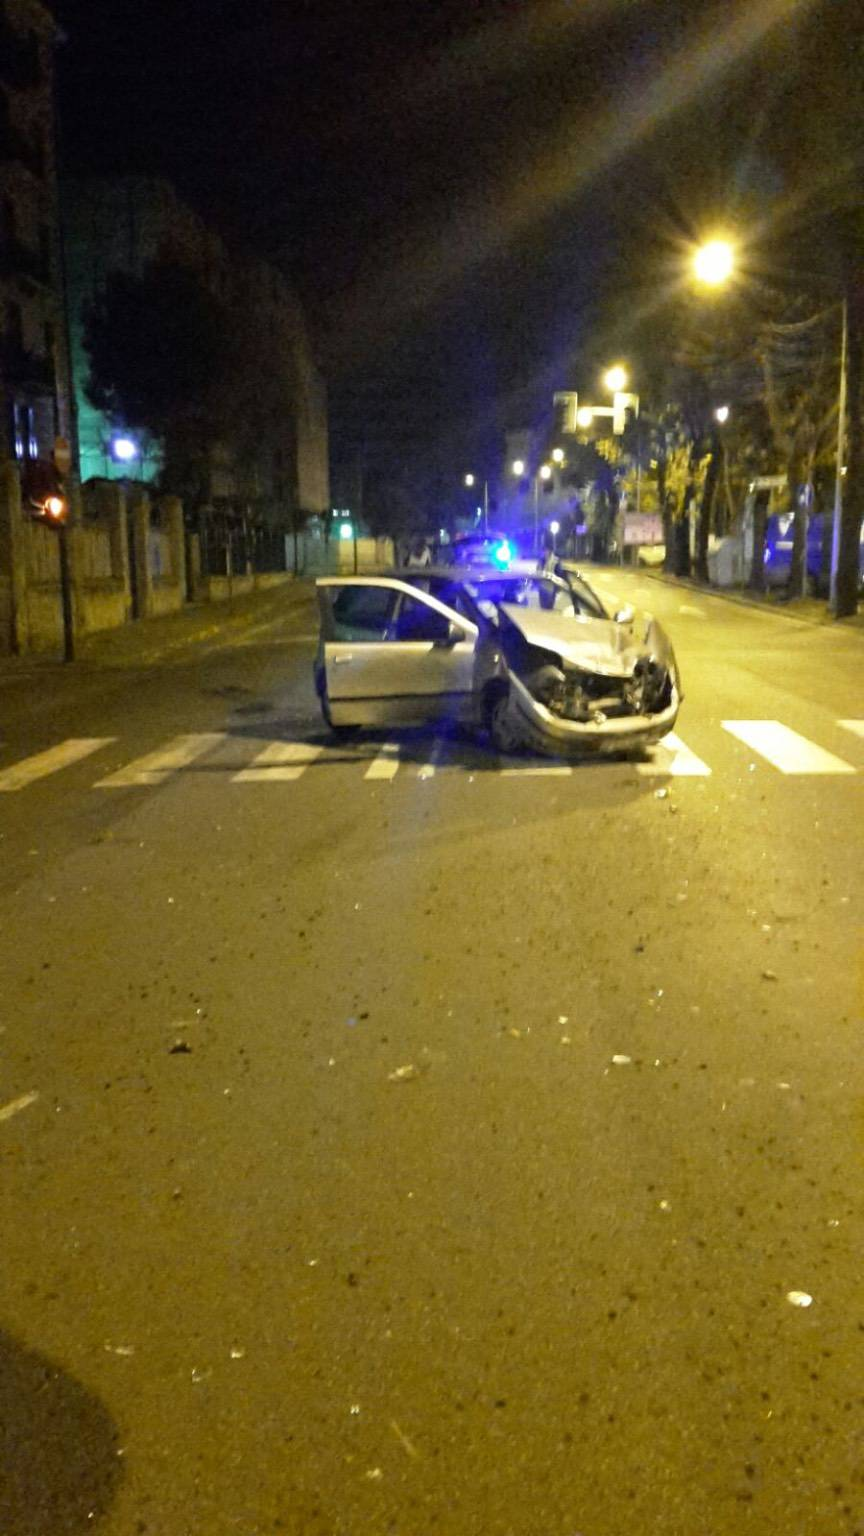 incidente notte polizia stradale